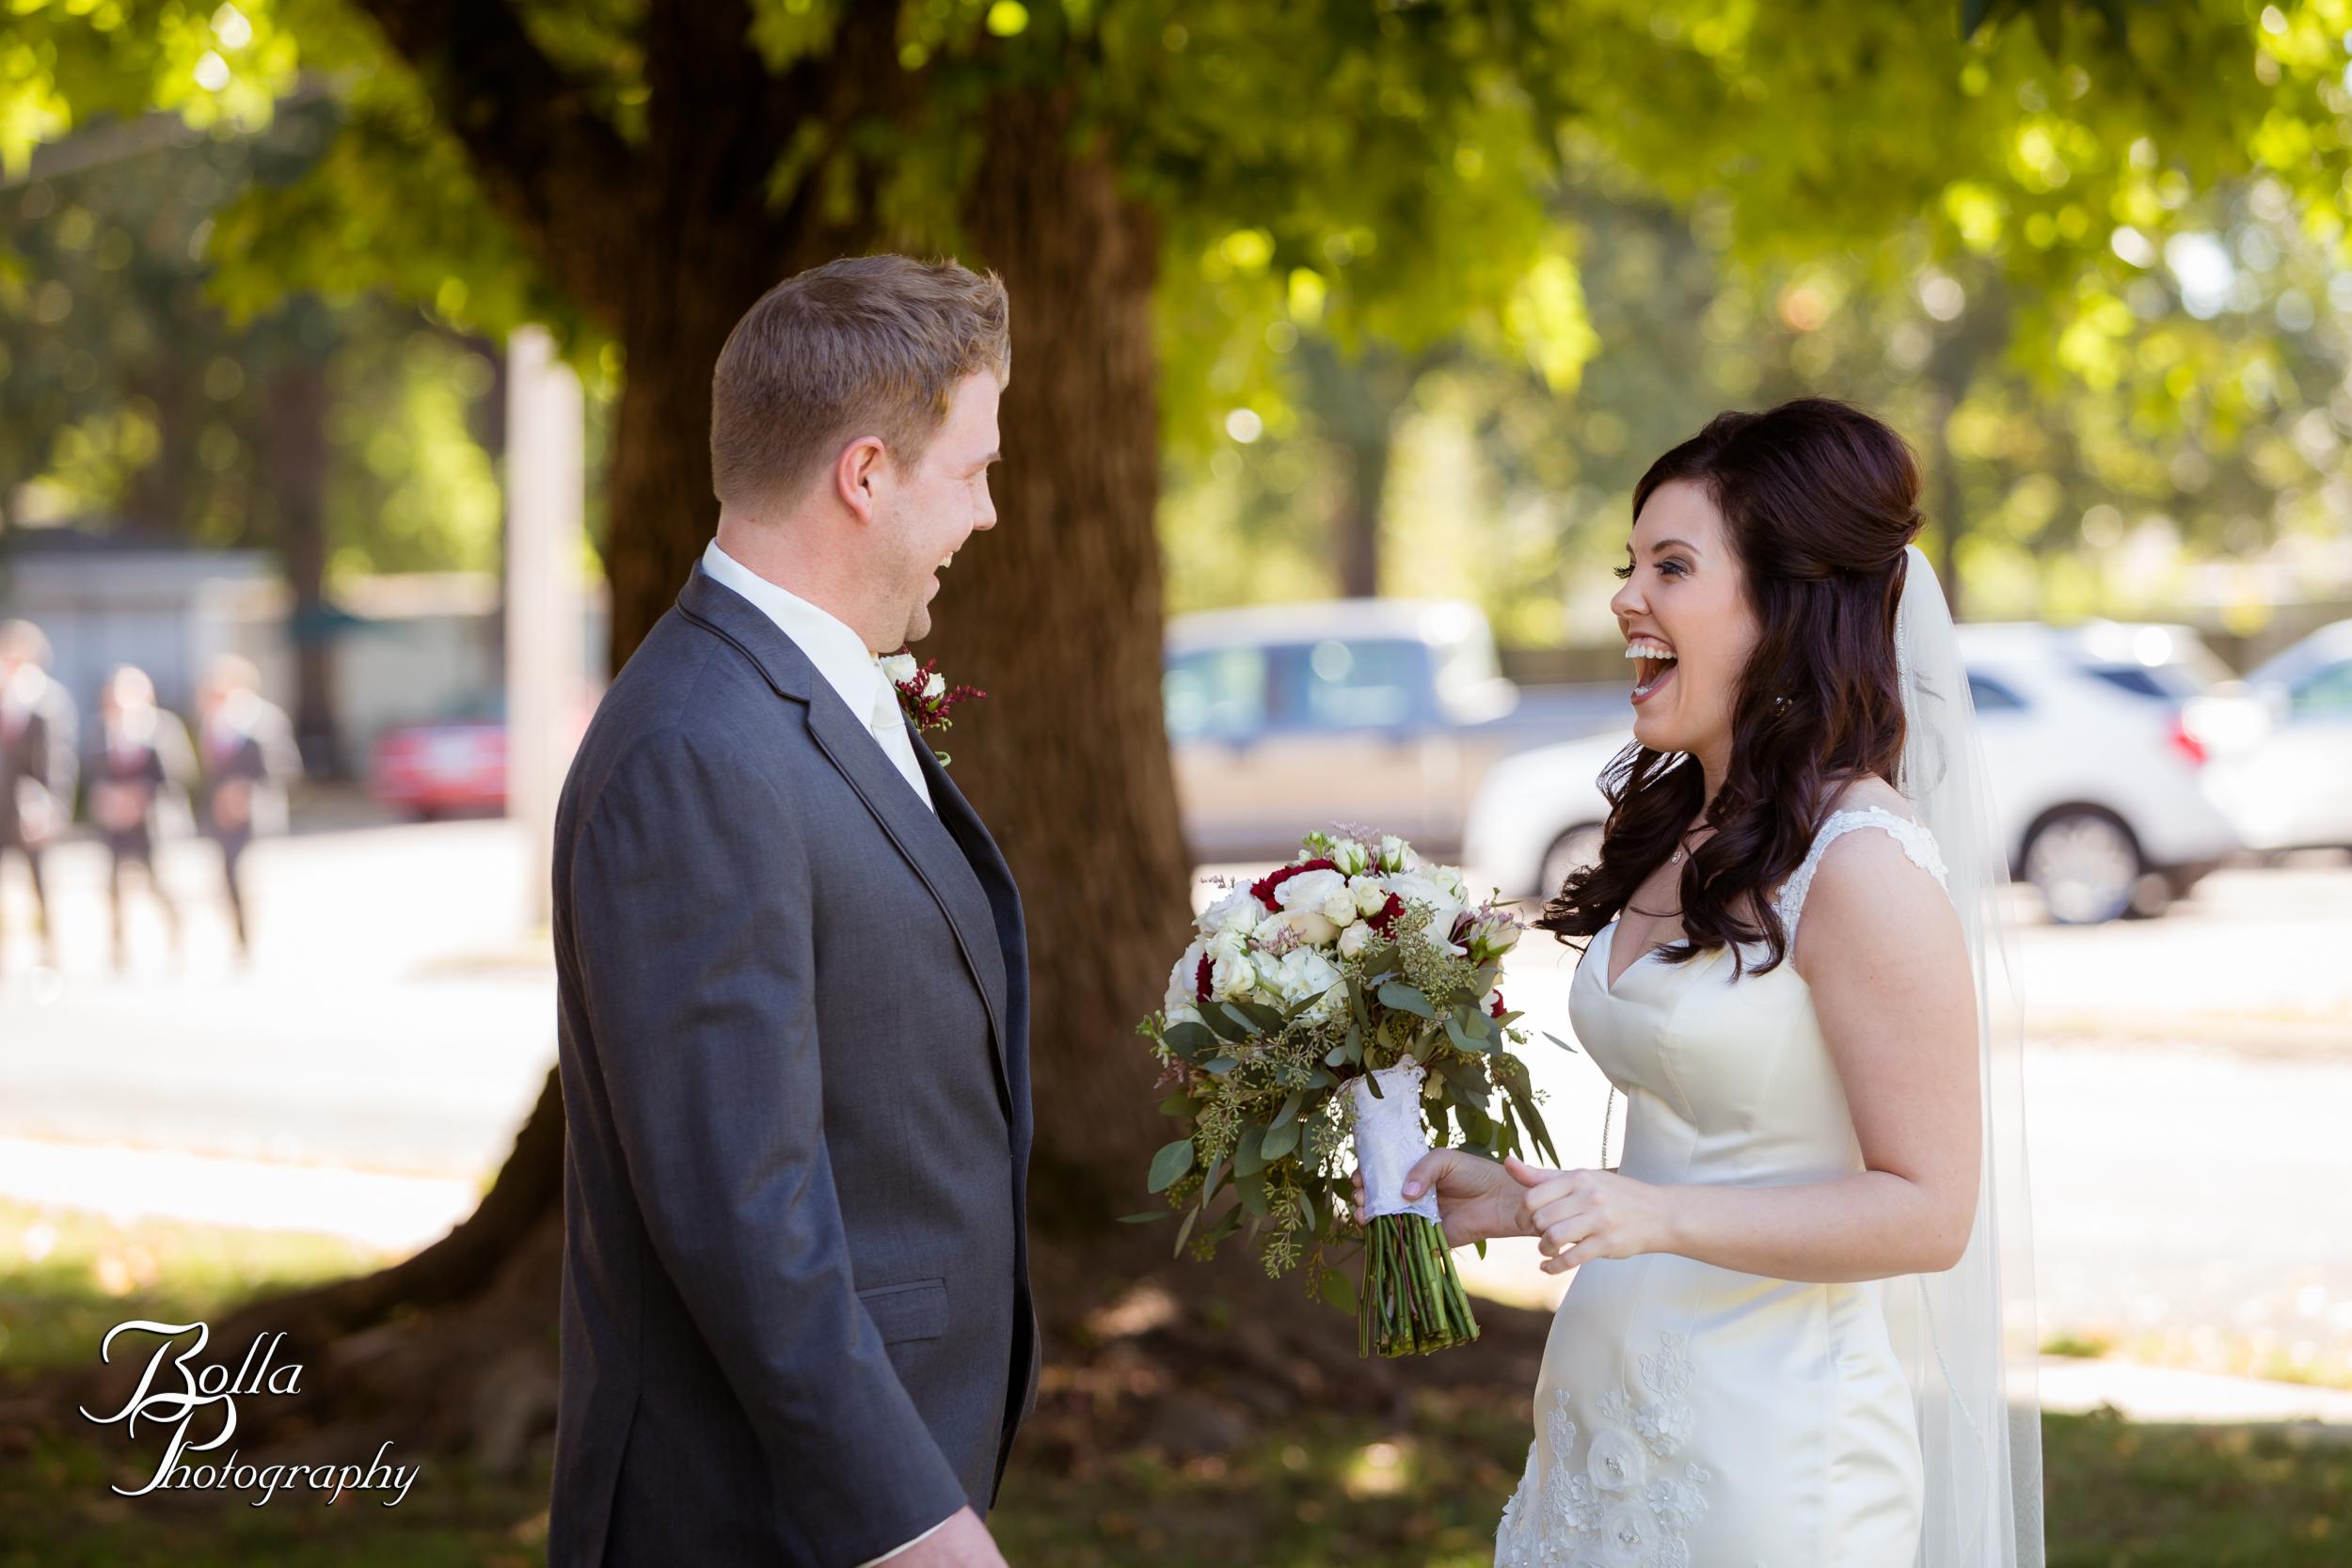 Bolla_photography_edwardsville_wedding_photographer_st_louis_weddings_Reilmann-0075.jpg